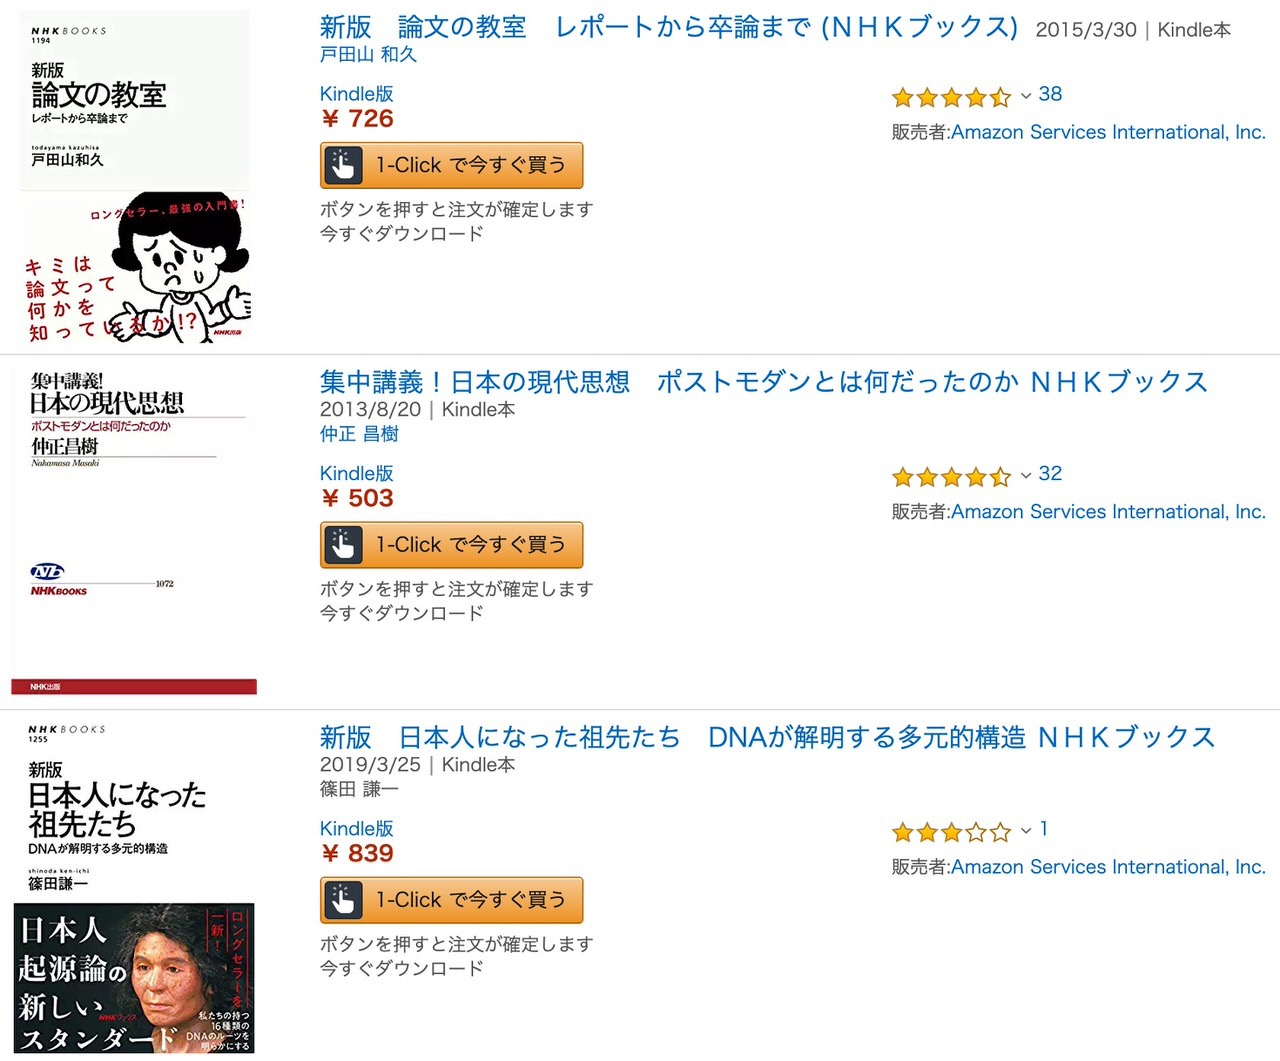 【Kindleセール】論文の教室、日本人になった祖先たち、図説 日本のメディアなど「NHKブックス」フェア開催中(6/6まで)